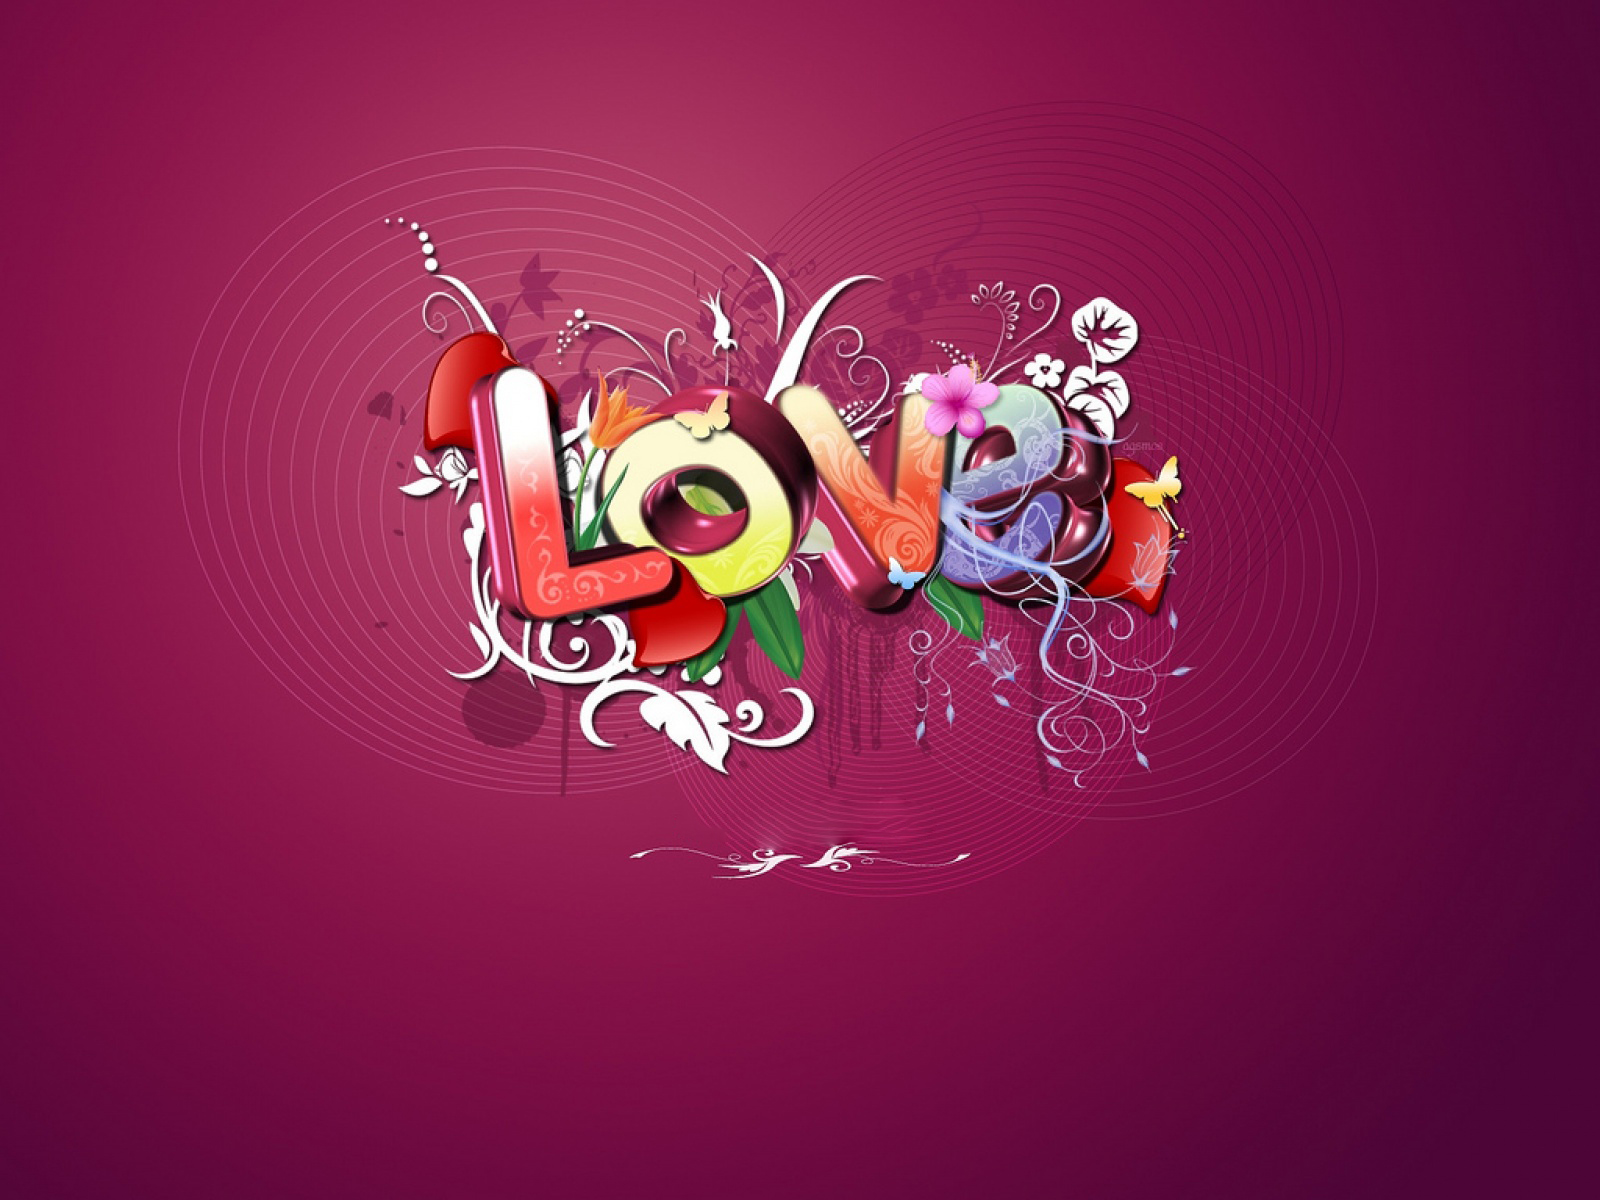 Valentines Day Wallpapers amp Desktop Backgrounds 1600x1200